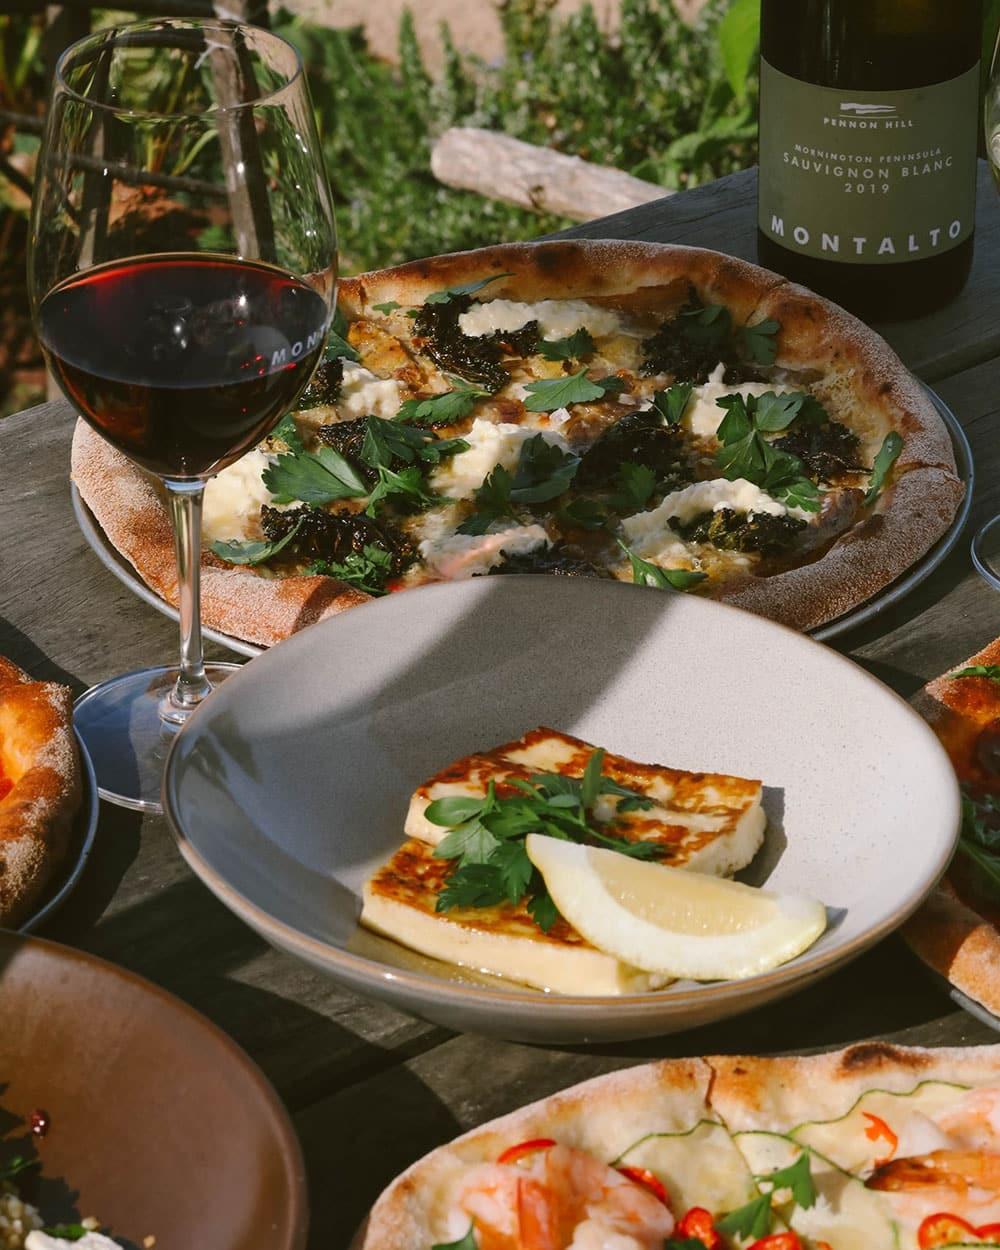 Montalto Pizzas and cooked halloumi